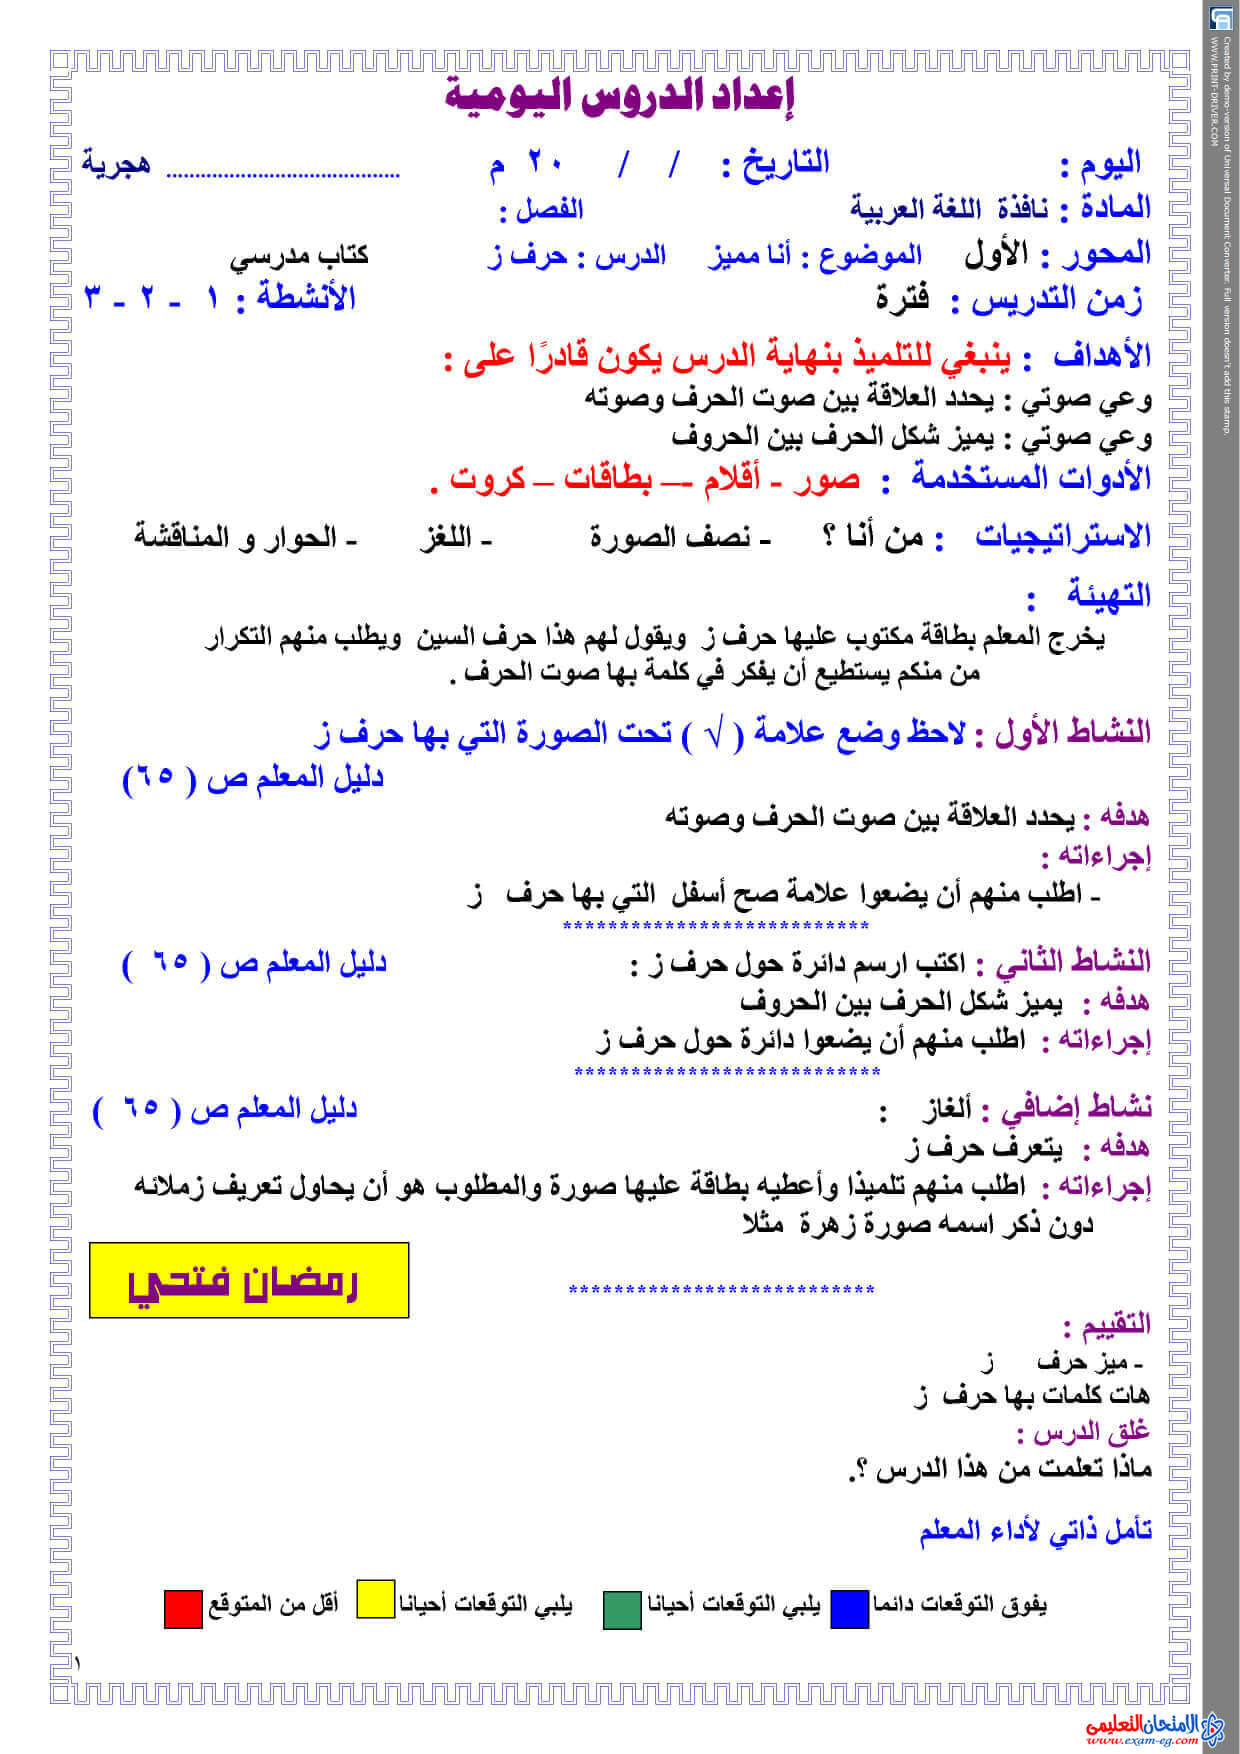 exam-eg.com_16079837011971.jpg